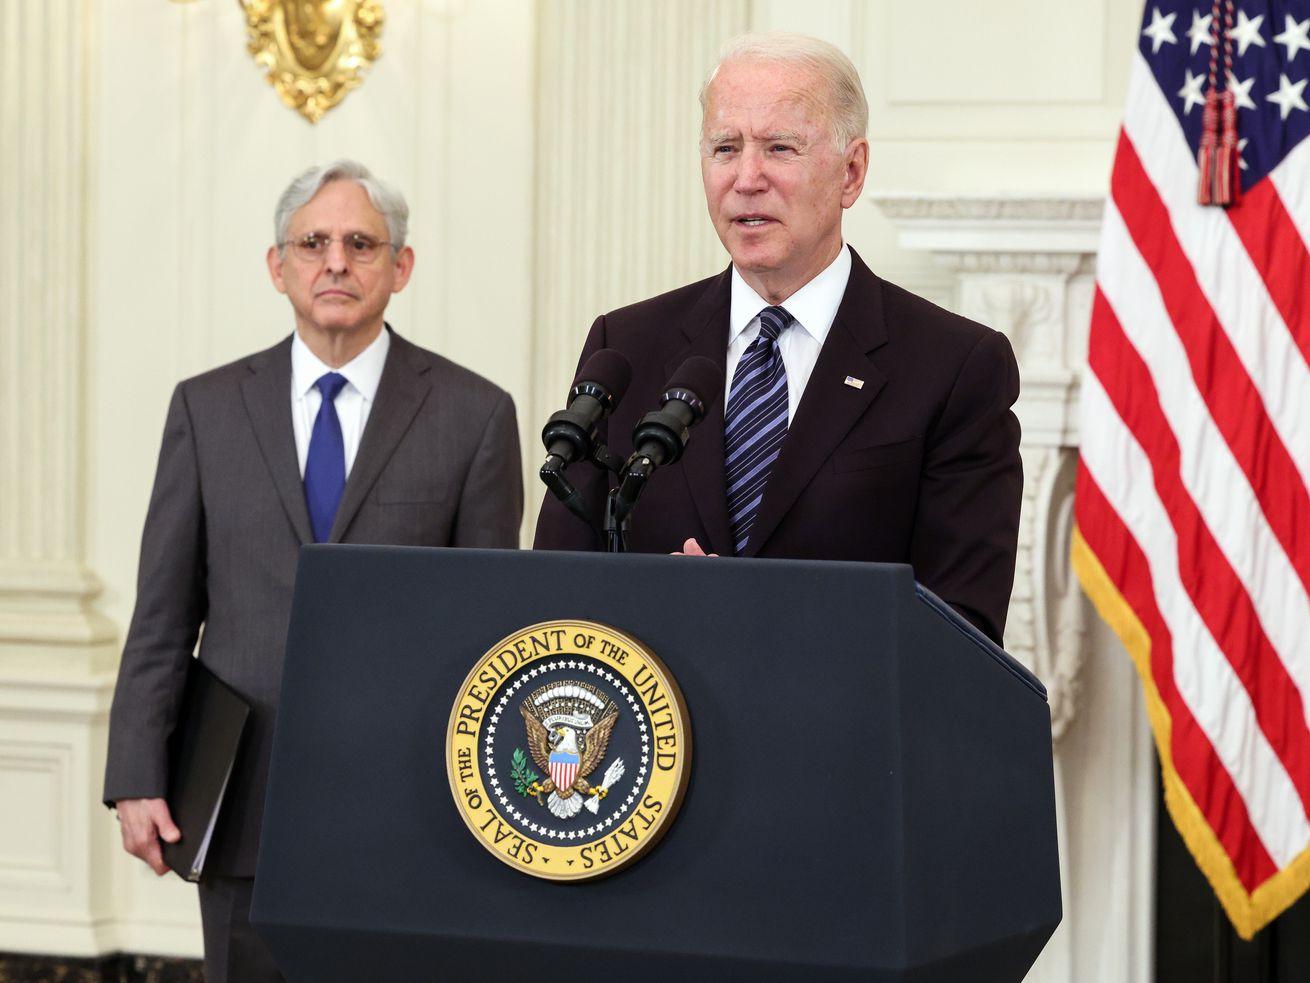 President Biden And Attorney General Garland Deliver Remarks On Gun Crime Prevention